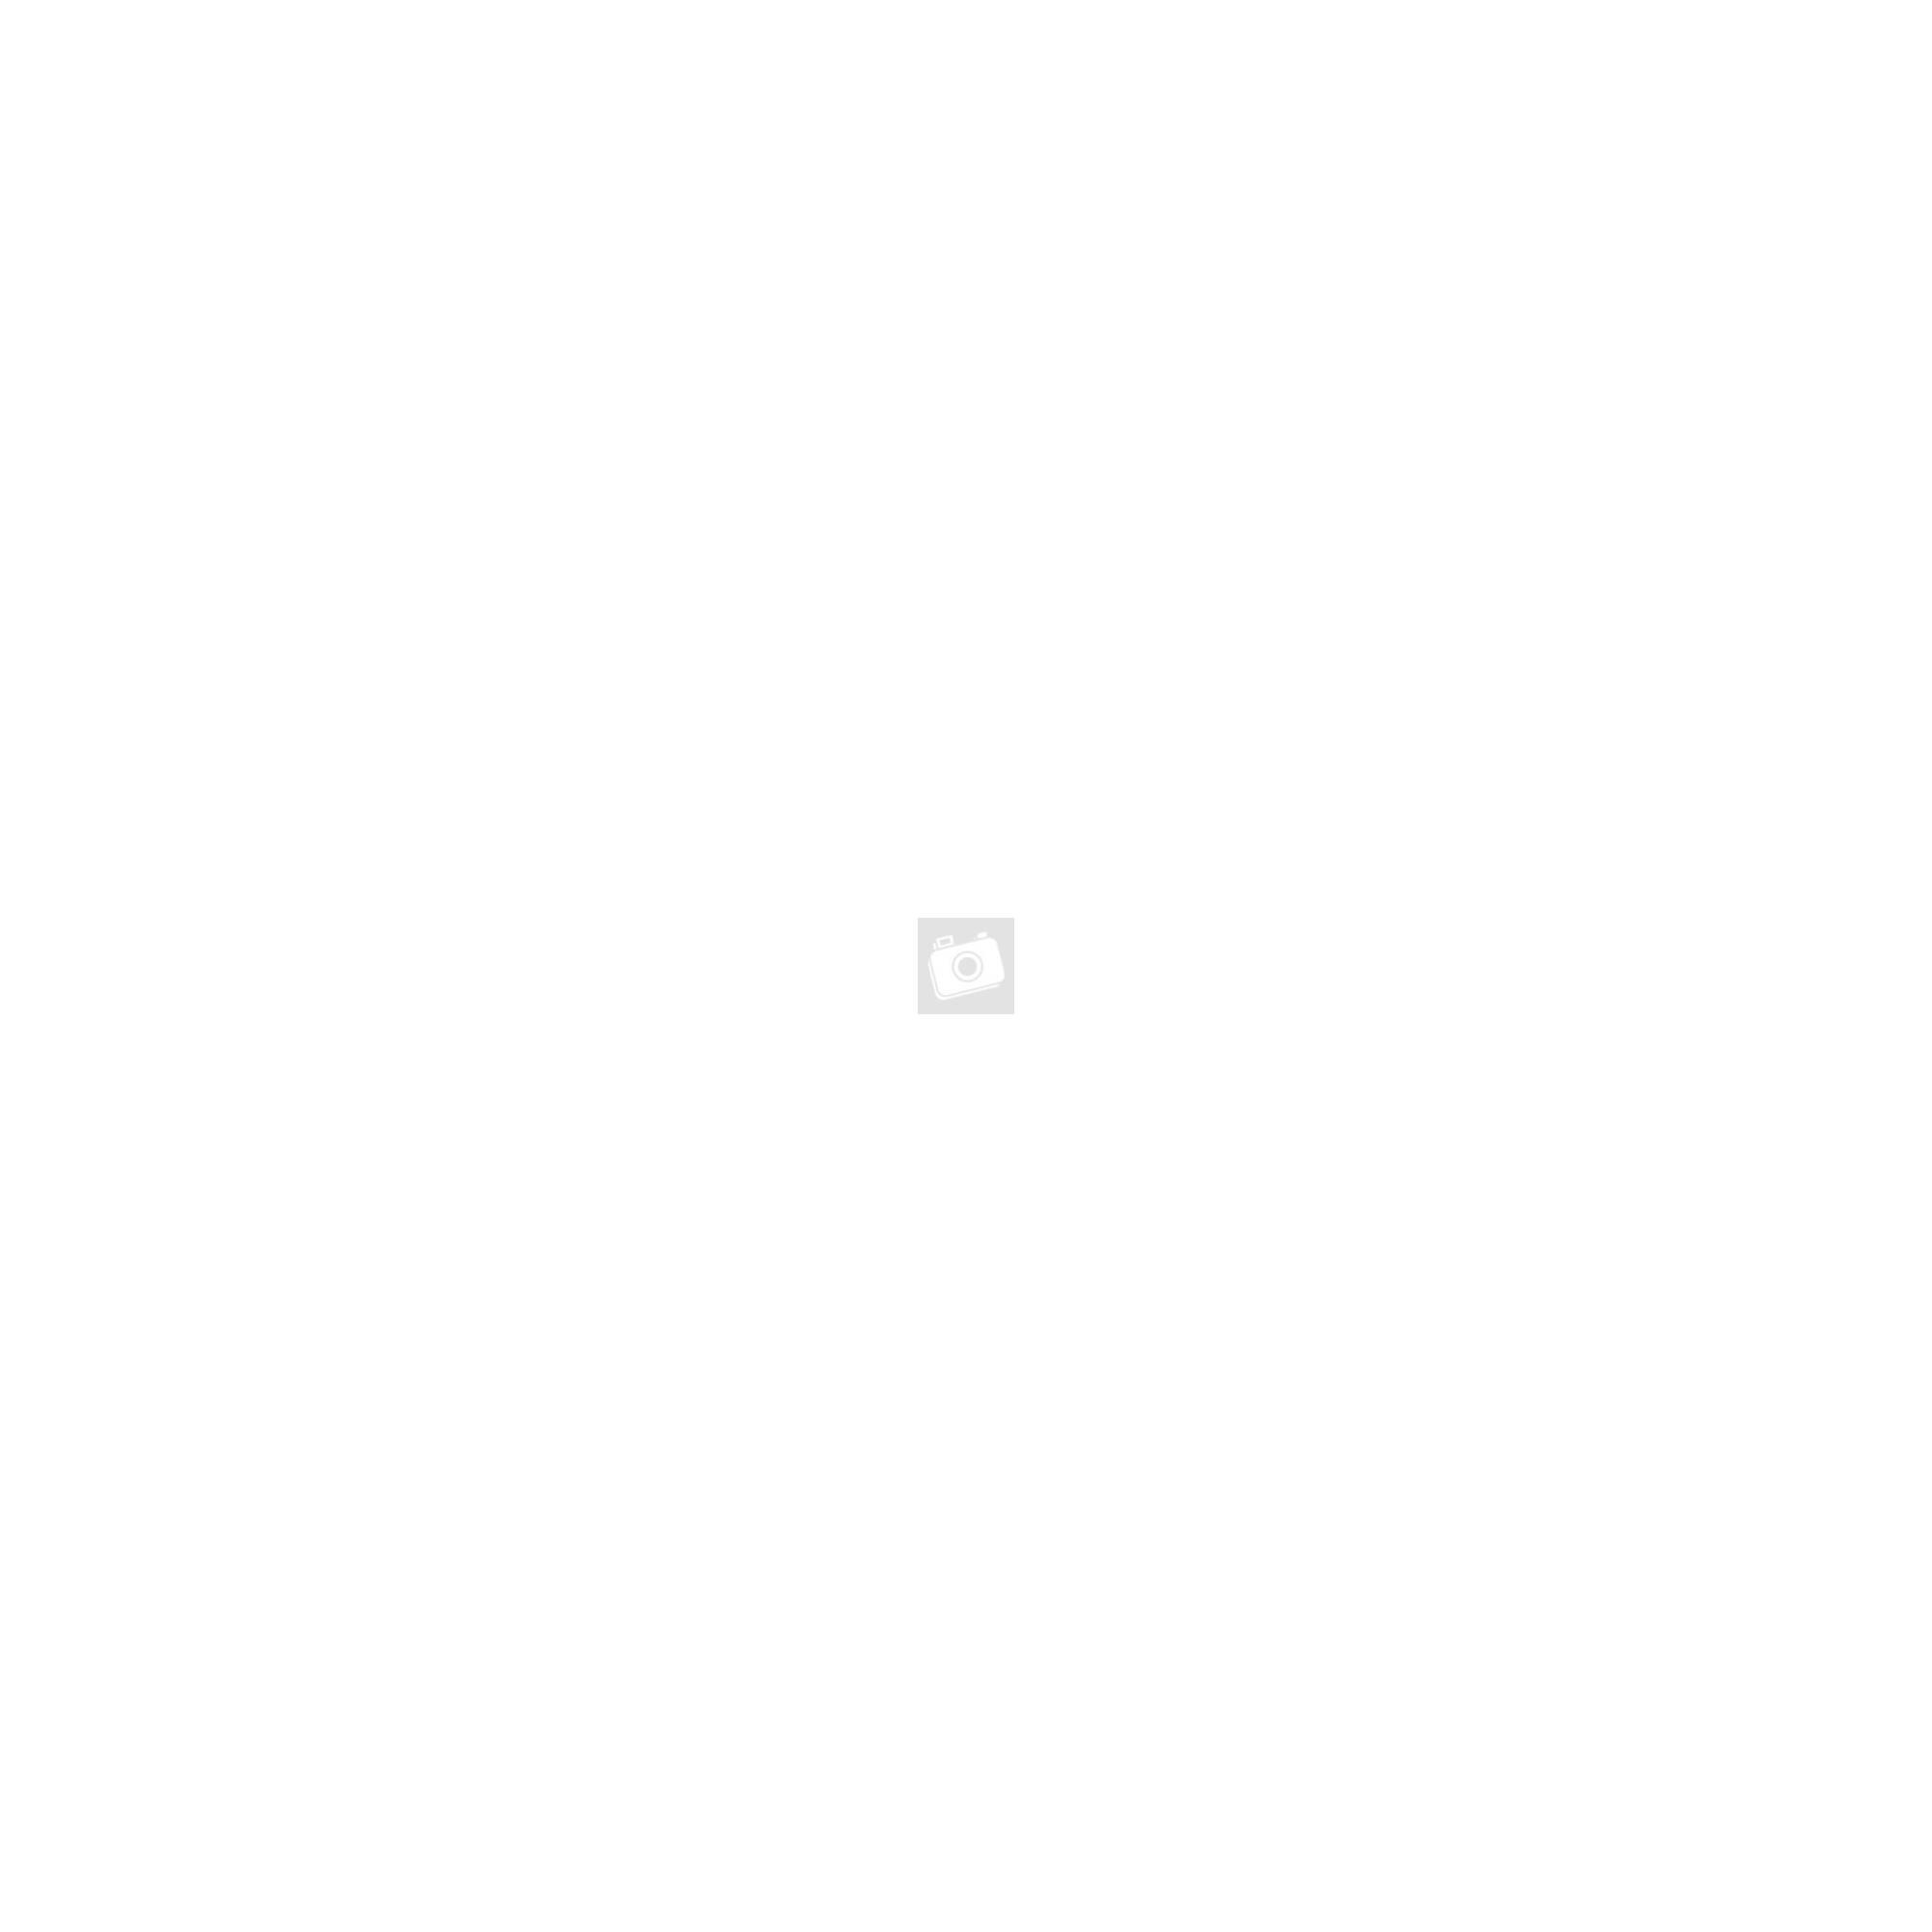 790a9ad5e2 CIPO AND BAXX - WHITE#NIGHT - Férfi Átmeneti kabát - Prémium kategória